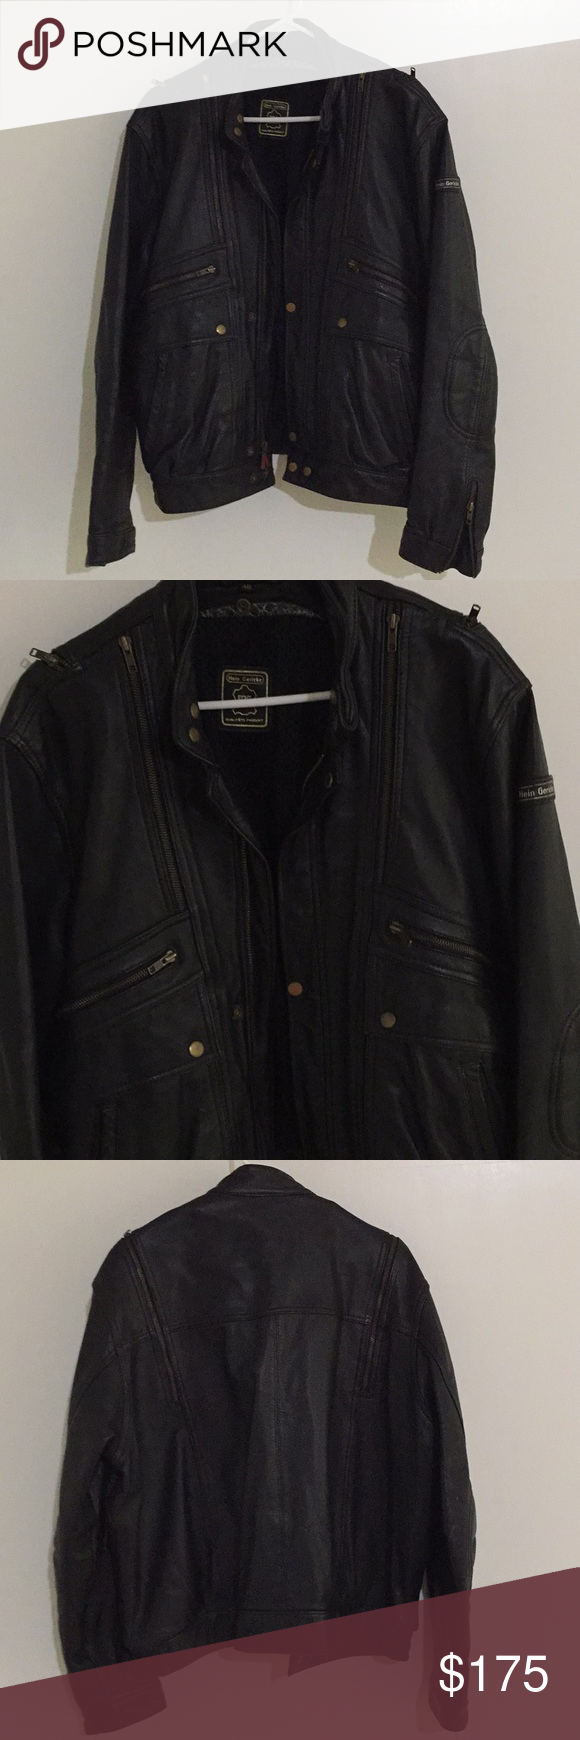 Vintage HEIN GERICKE leather Jacket, Leather jacket